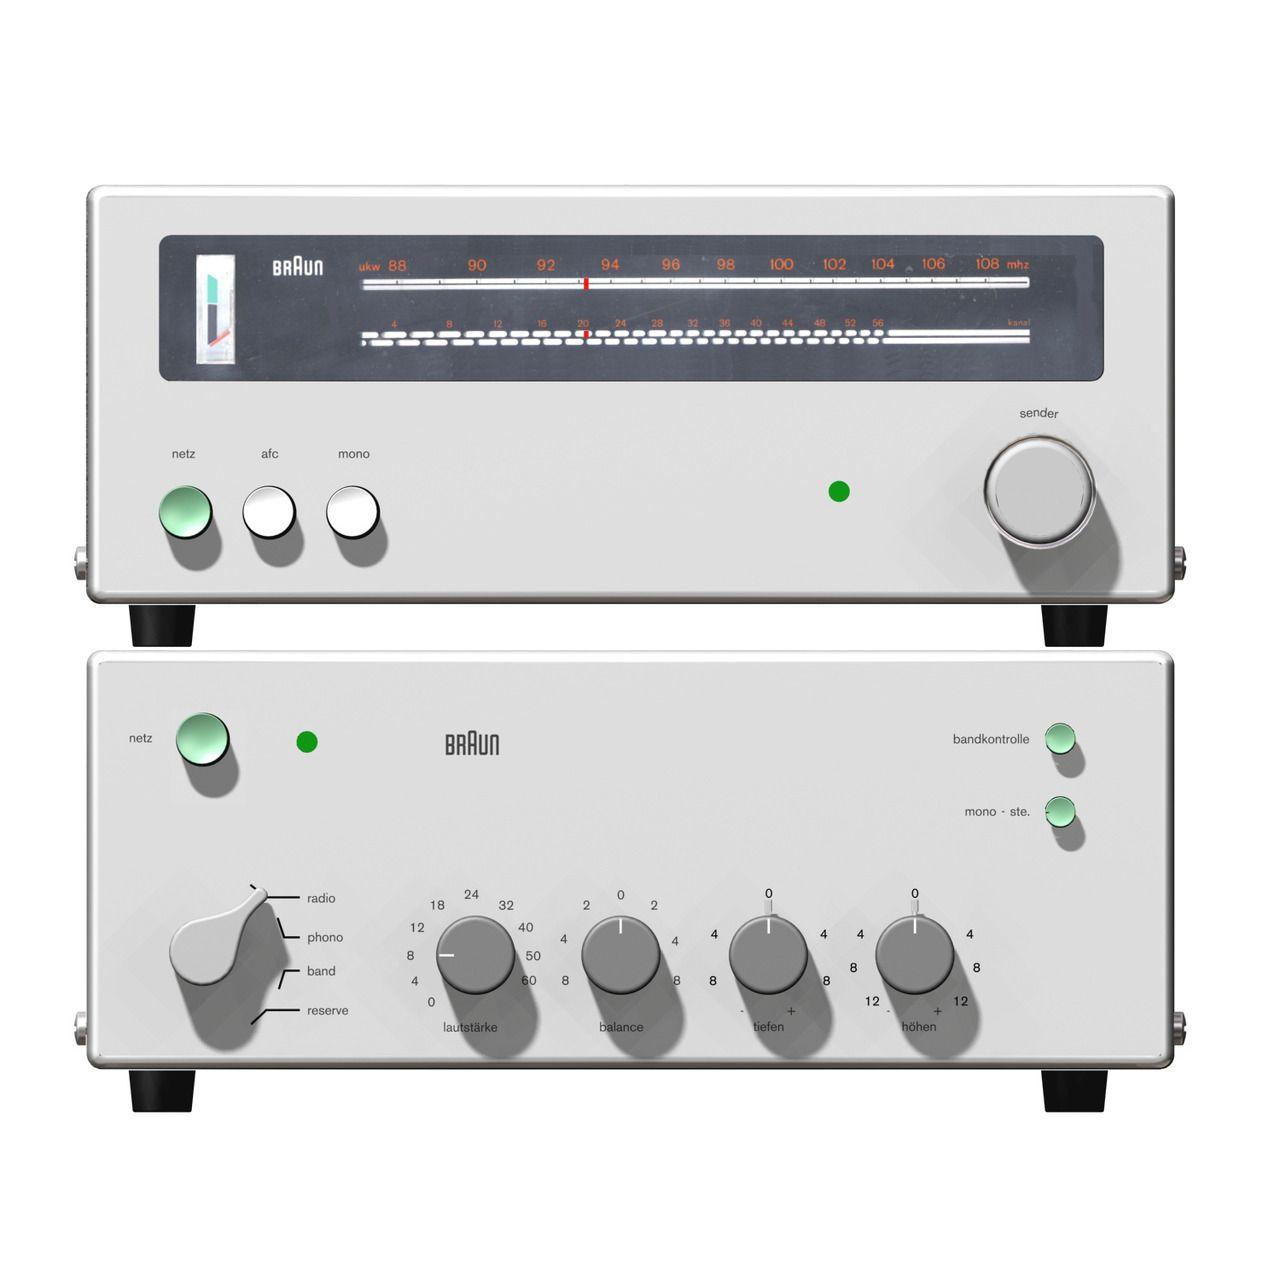 Braun amplifier & tuner | Video killed the radio star ...